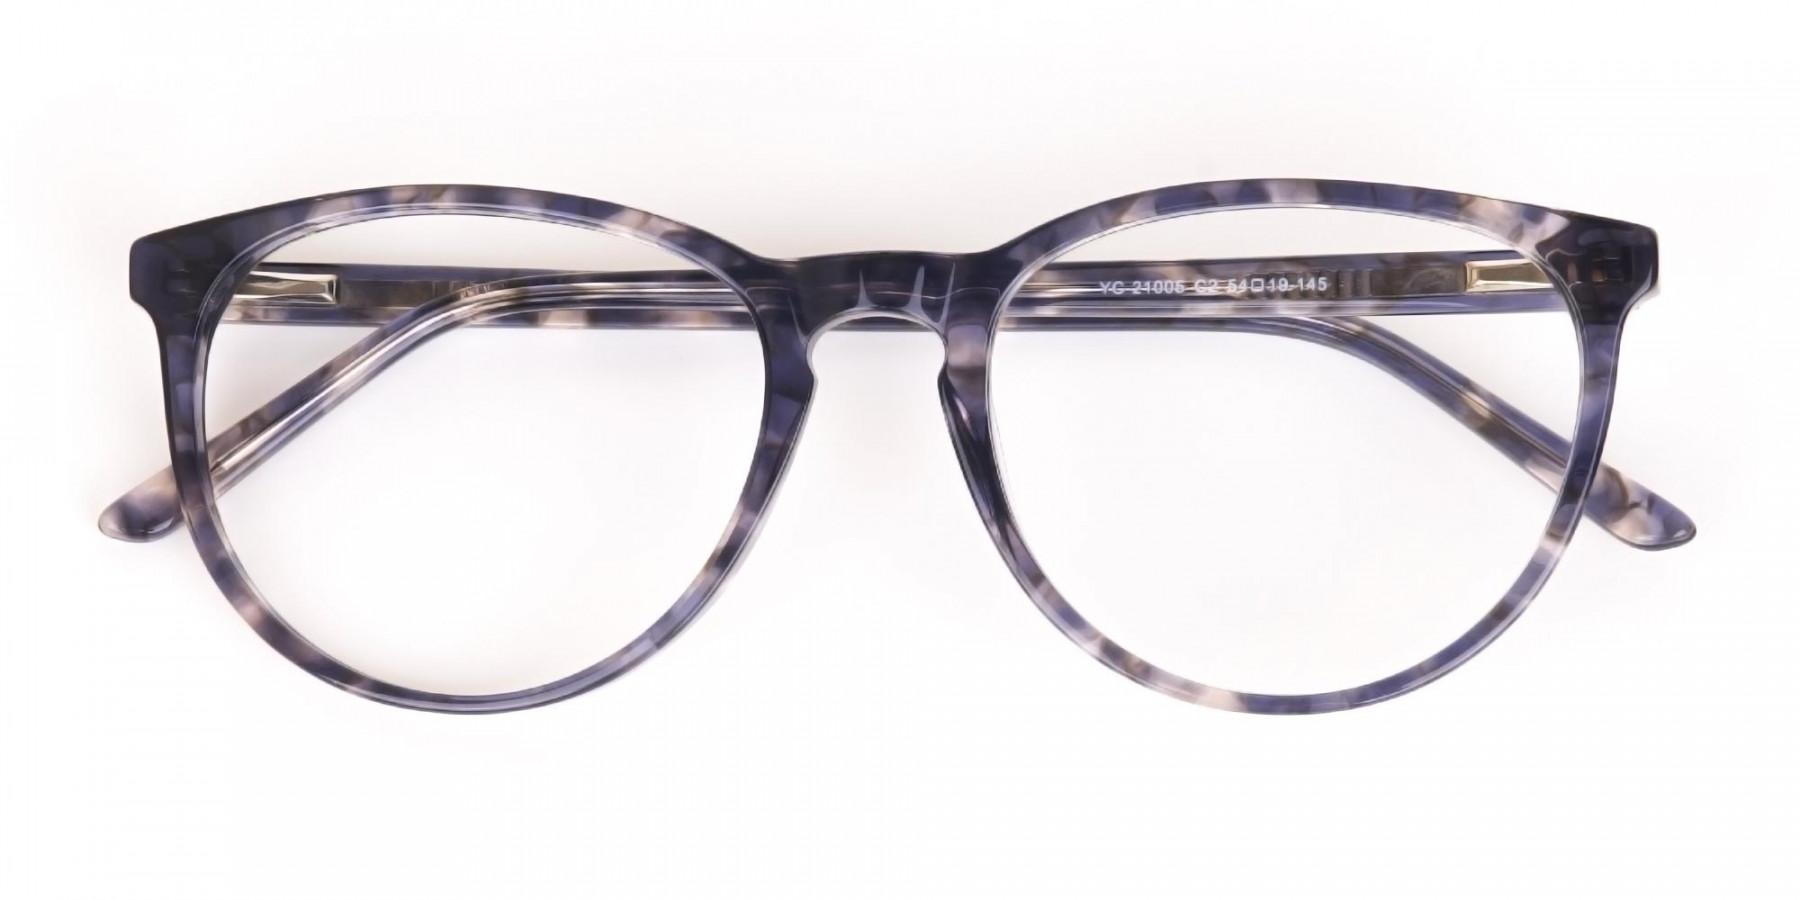 Dusty Blue Tortoise Acetate Round Glasses Frame-1